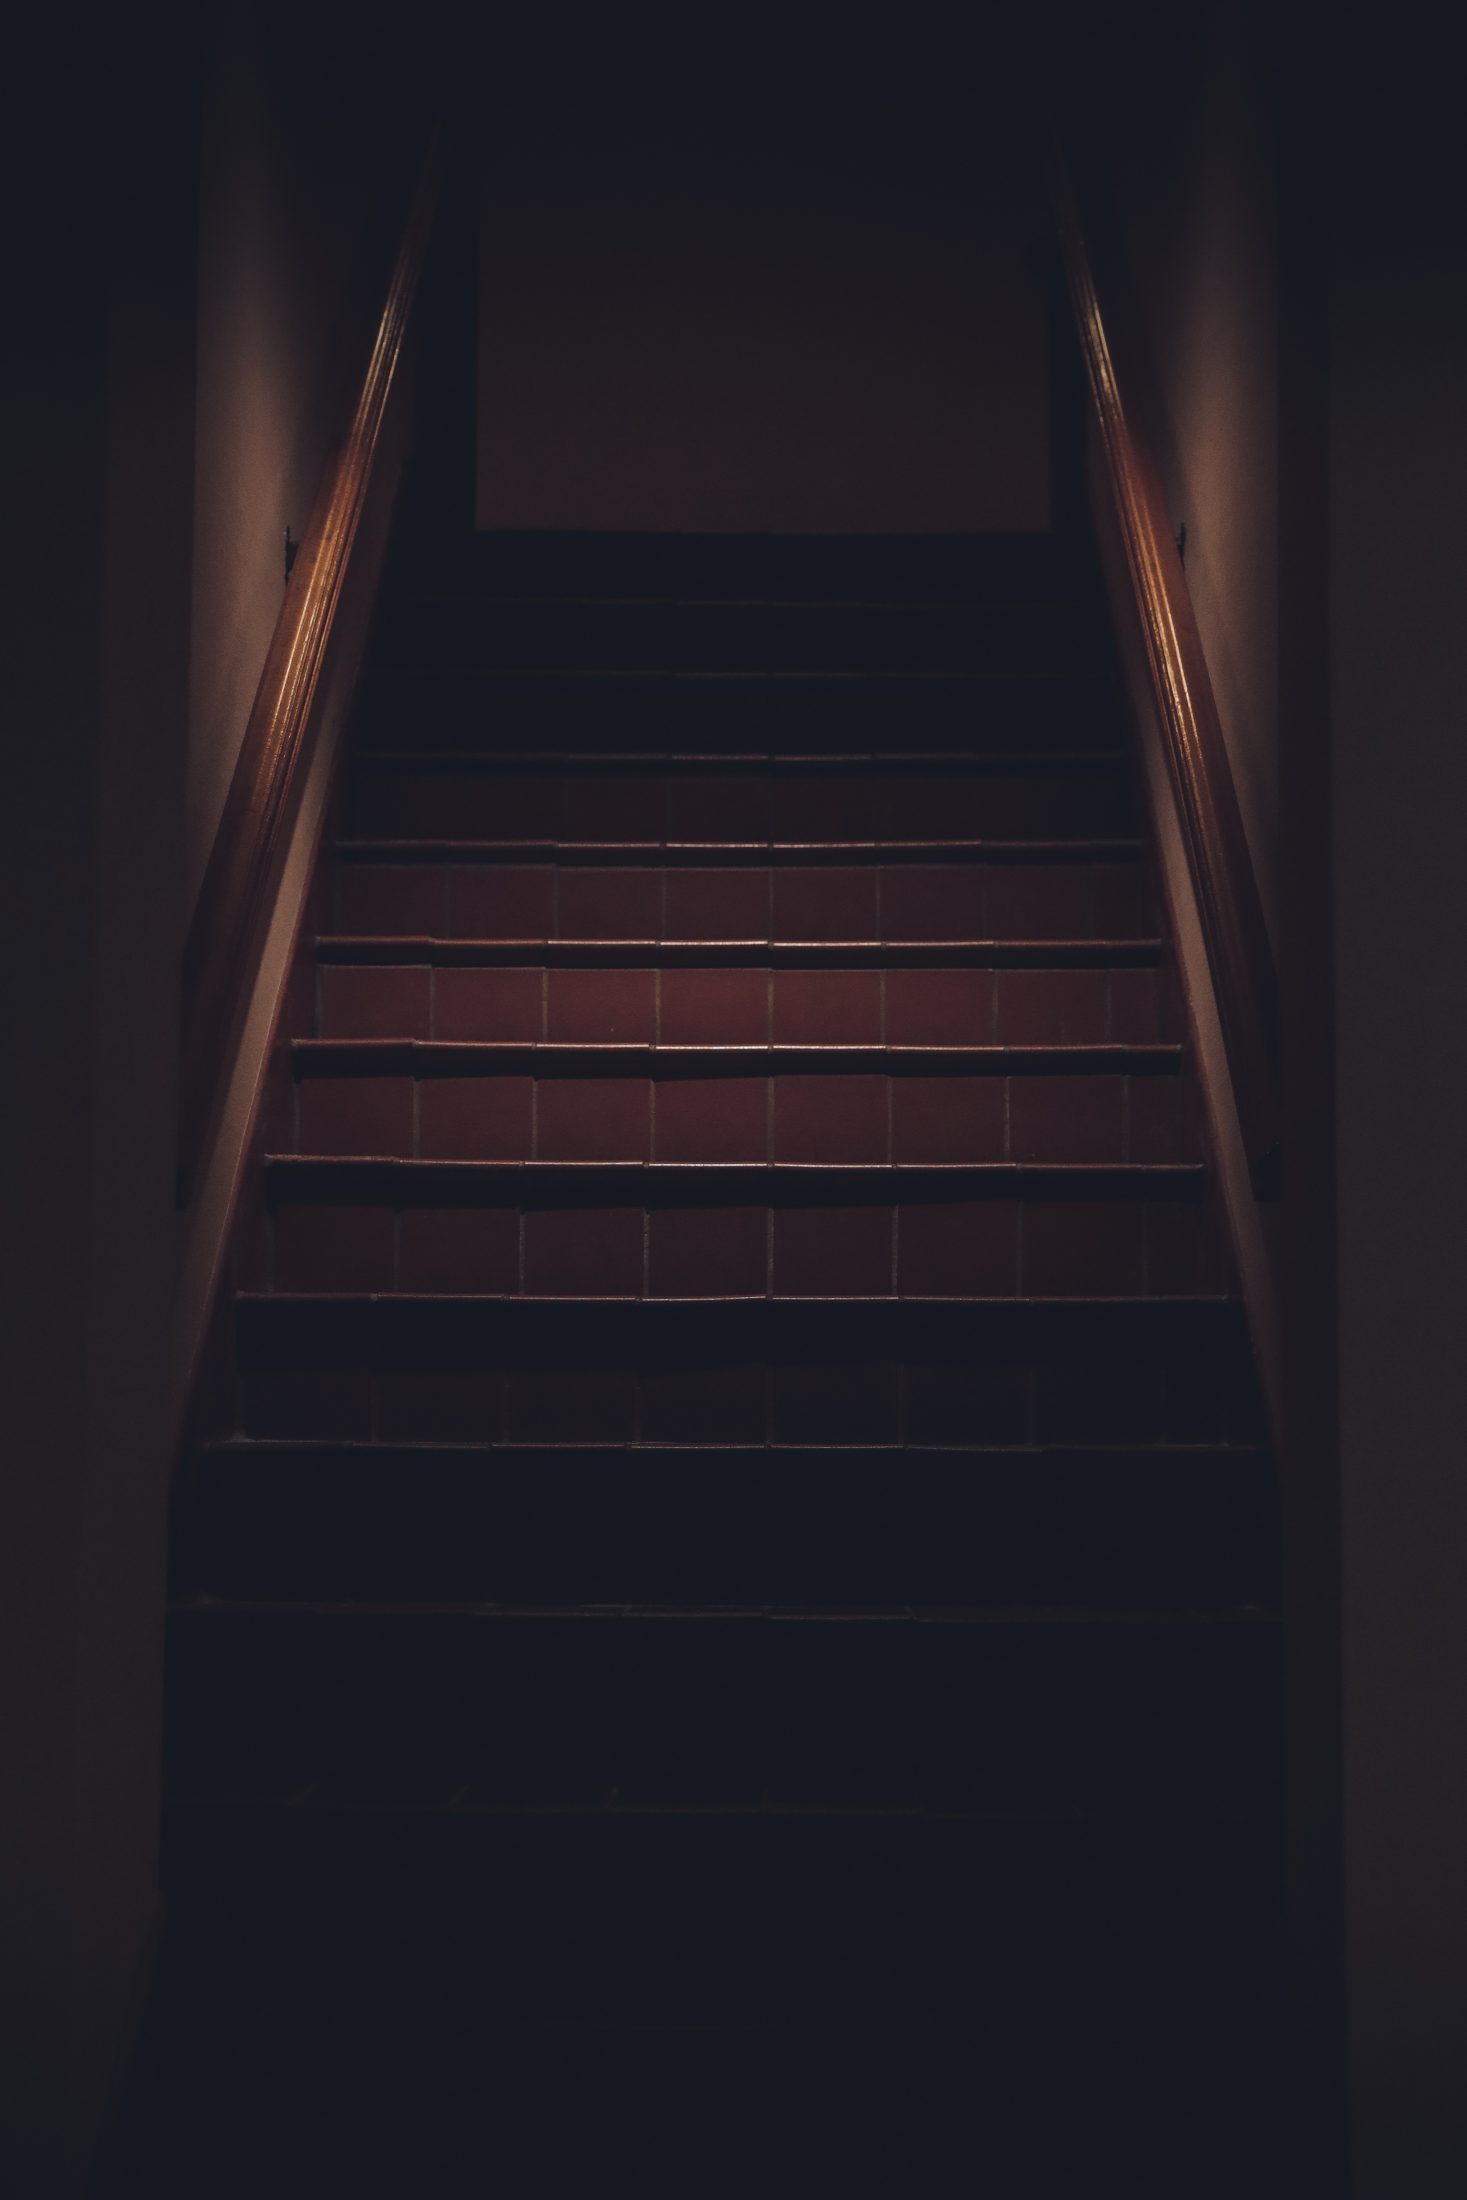 Dimly Lit Staircase